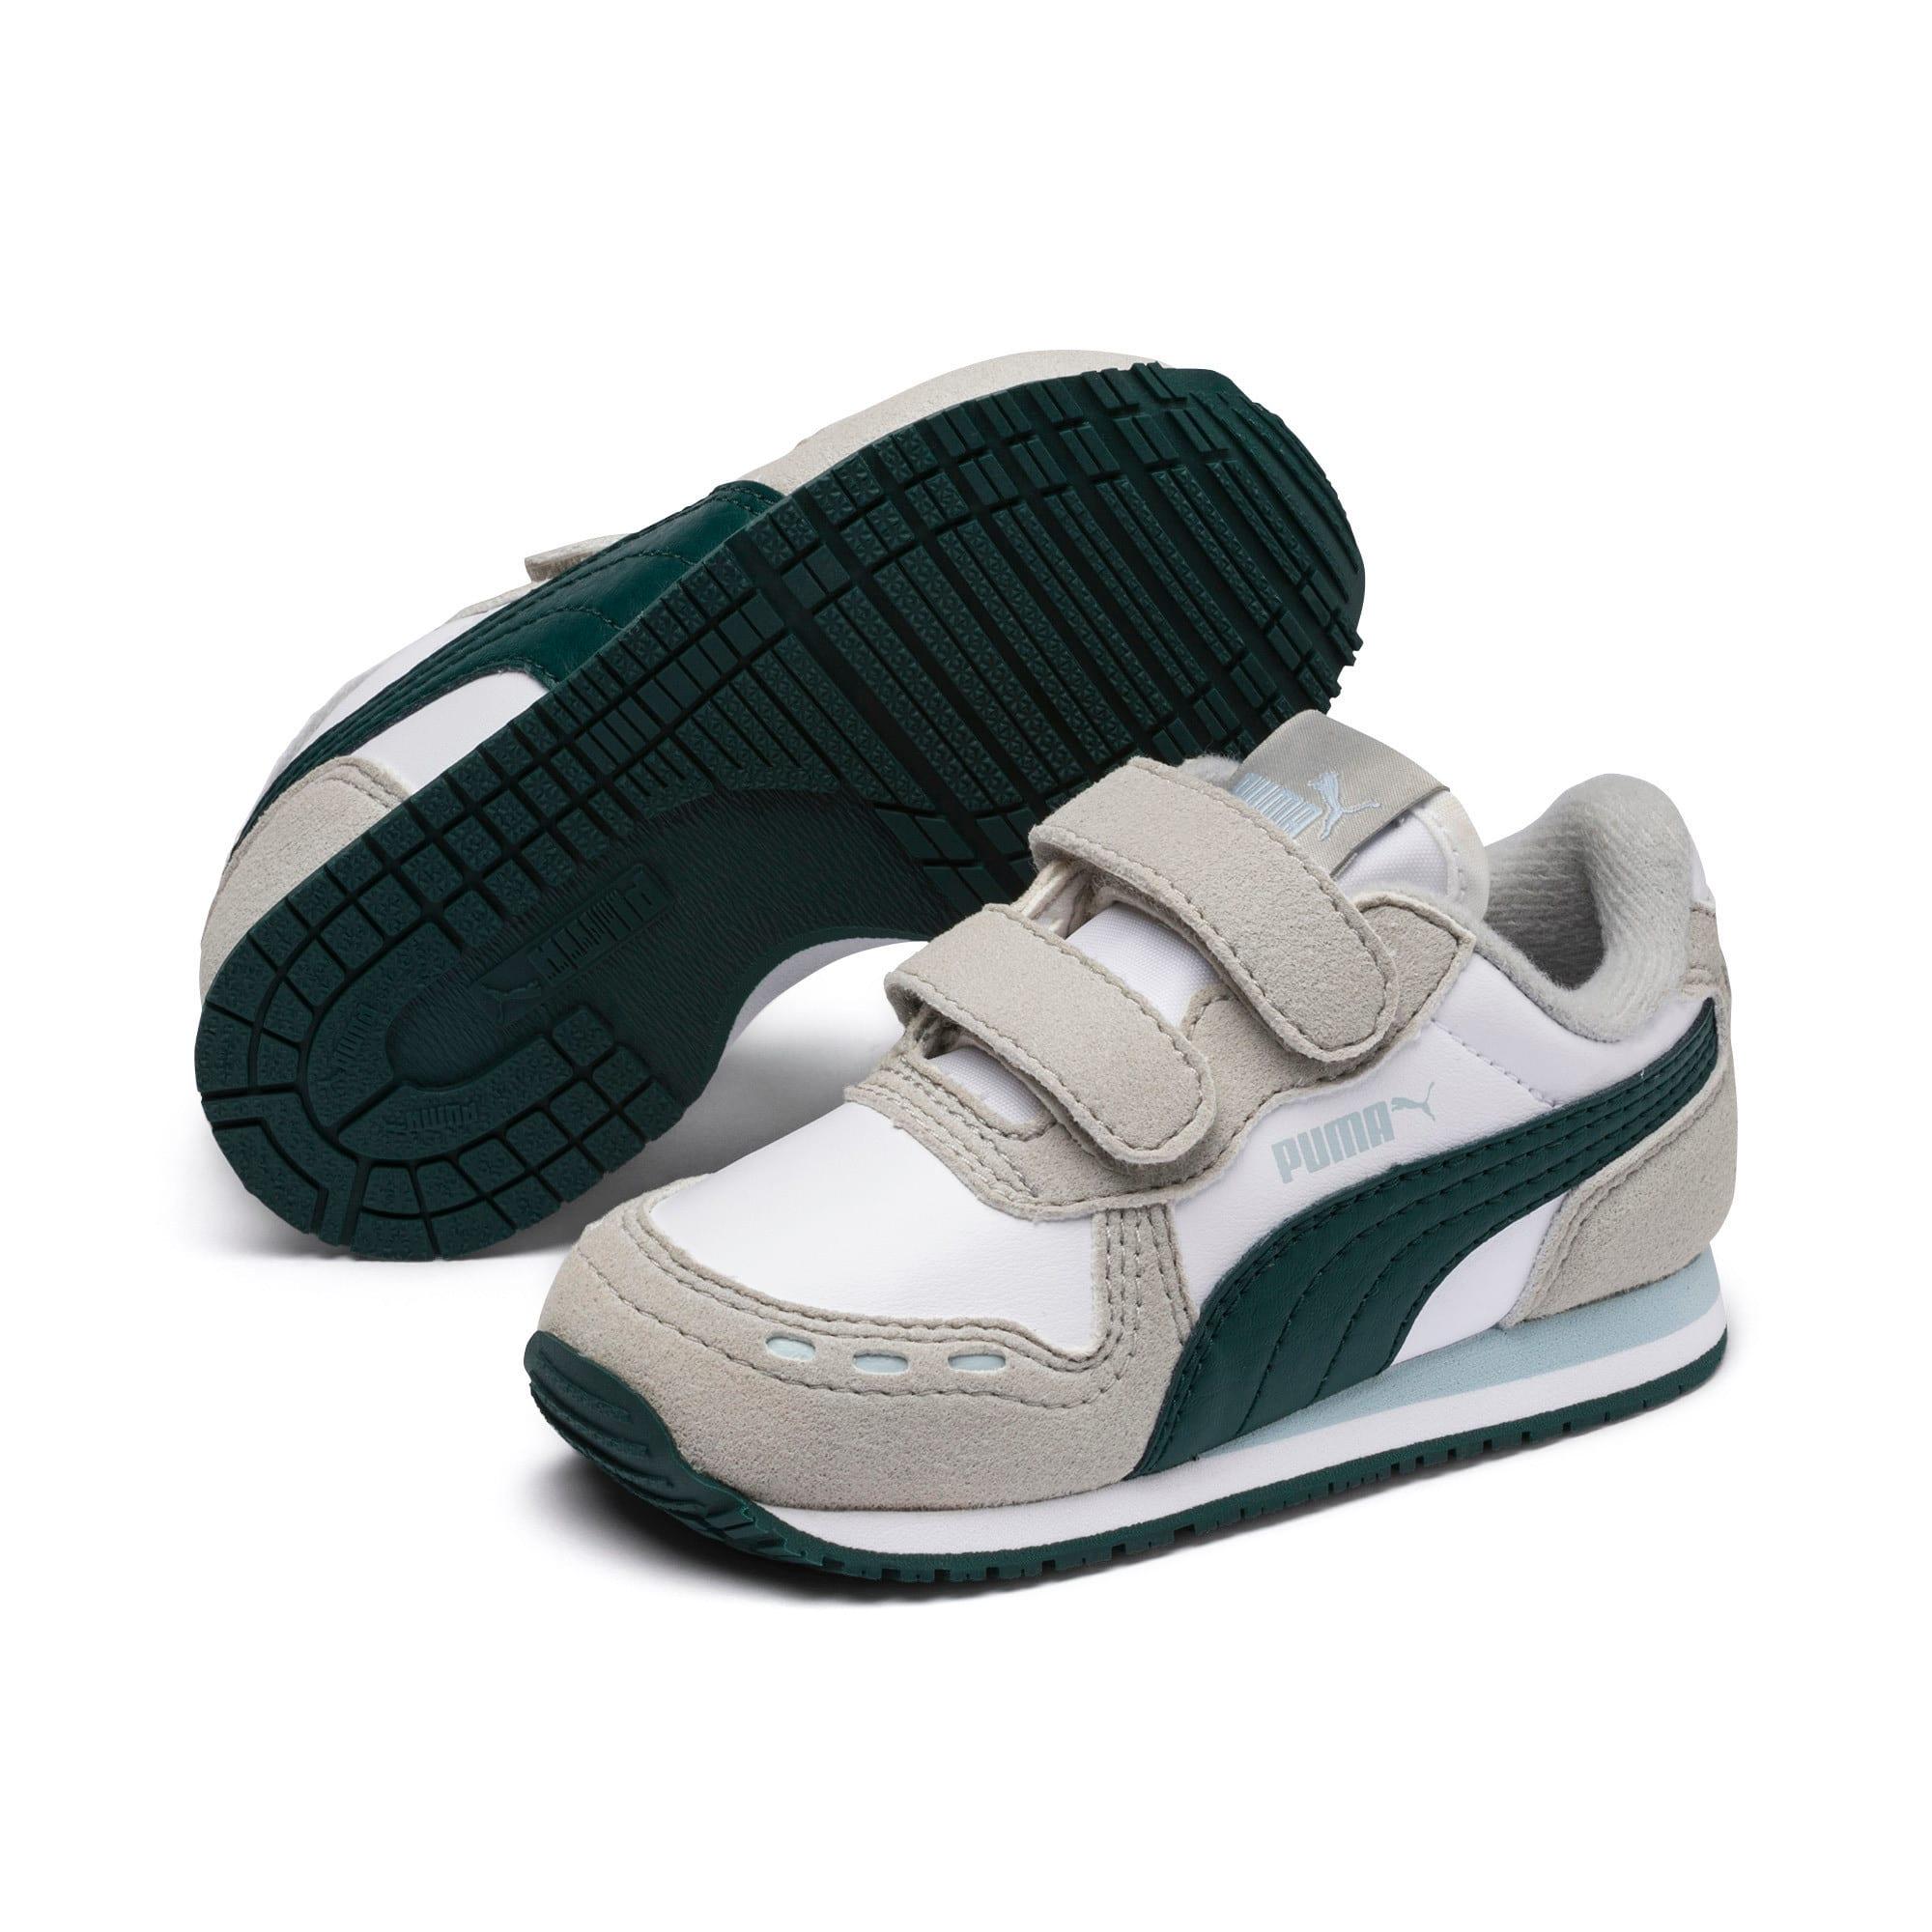 Thumbnail 2 of Cabana Racer SL Toddler Shoes, Puma White-Gray Violet, medium